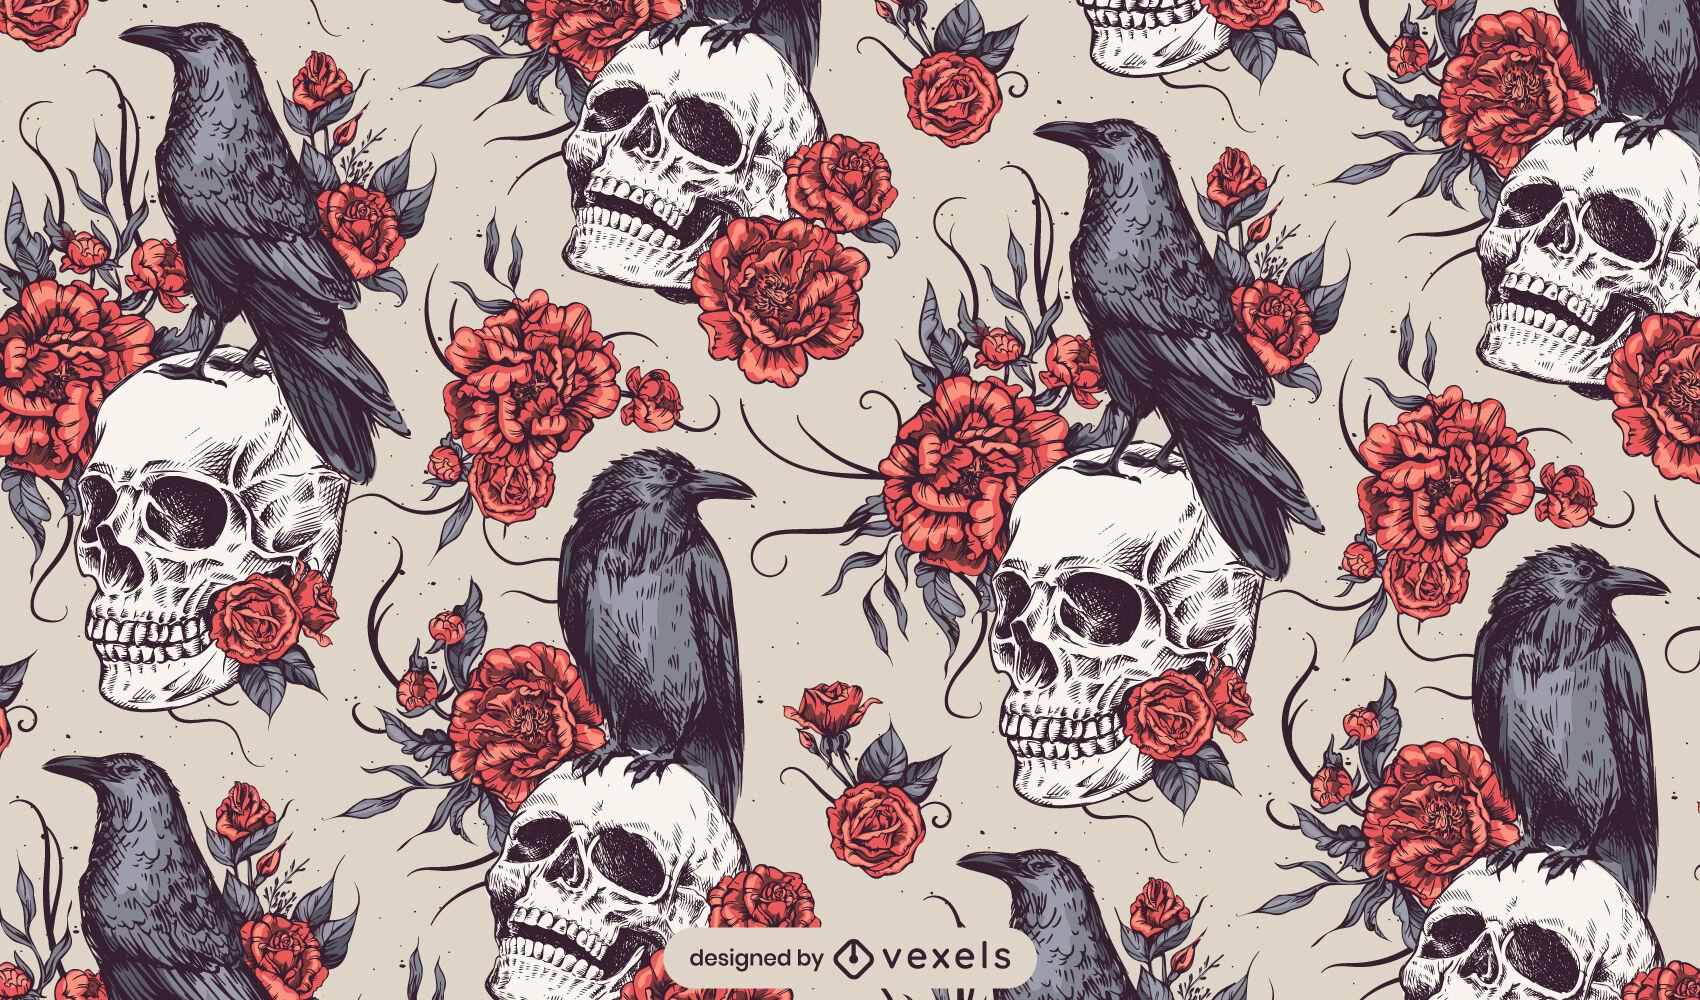 Totenkopf Rabenrosen Gothic-Muster-Design